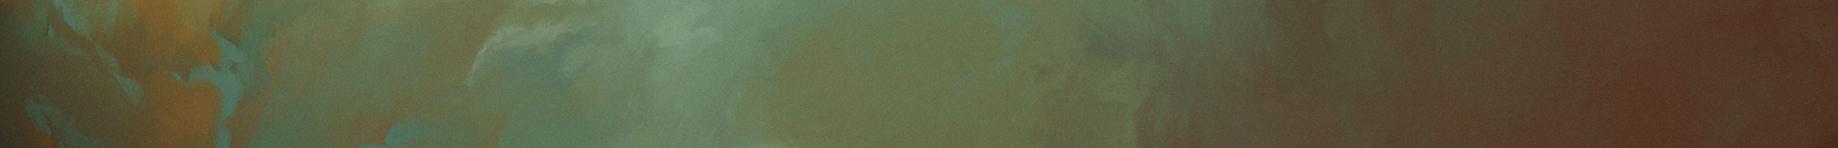 <div class='title'>           texture01-z0klc5         </div>